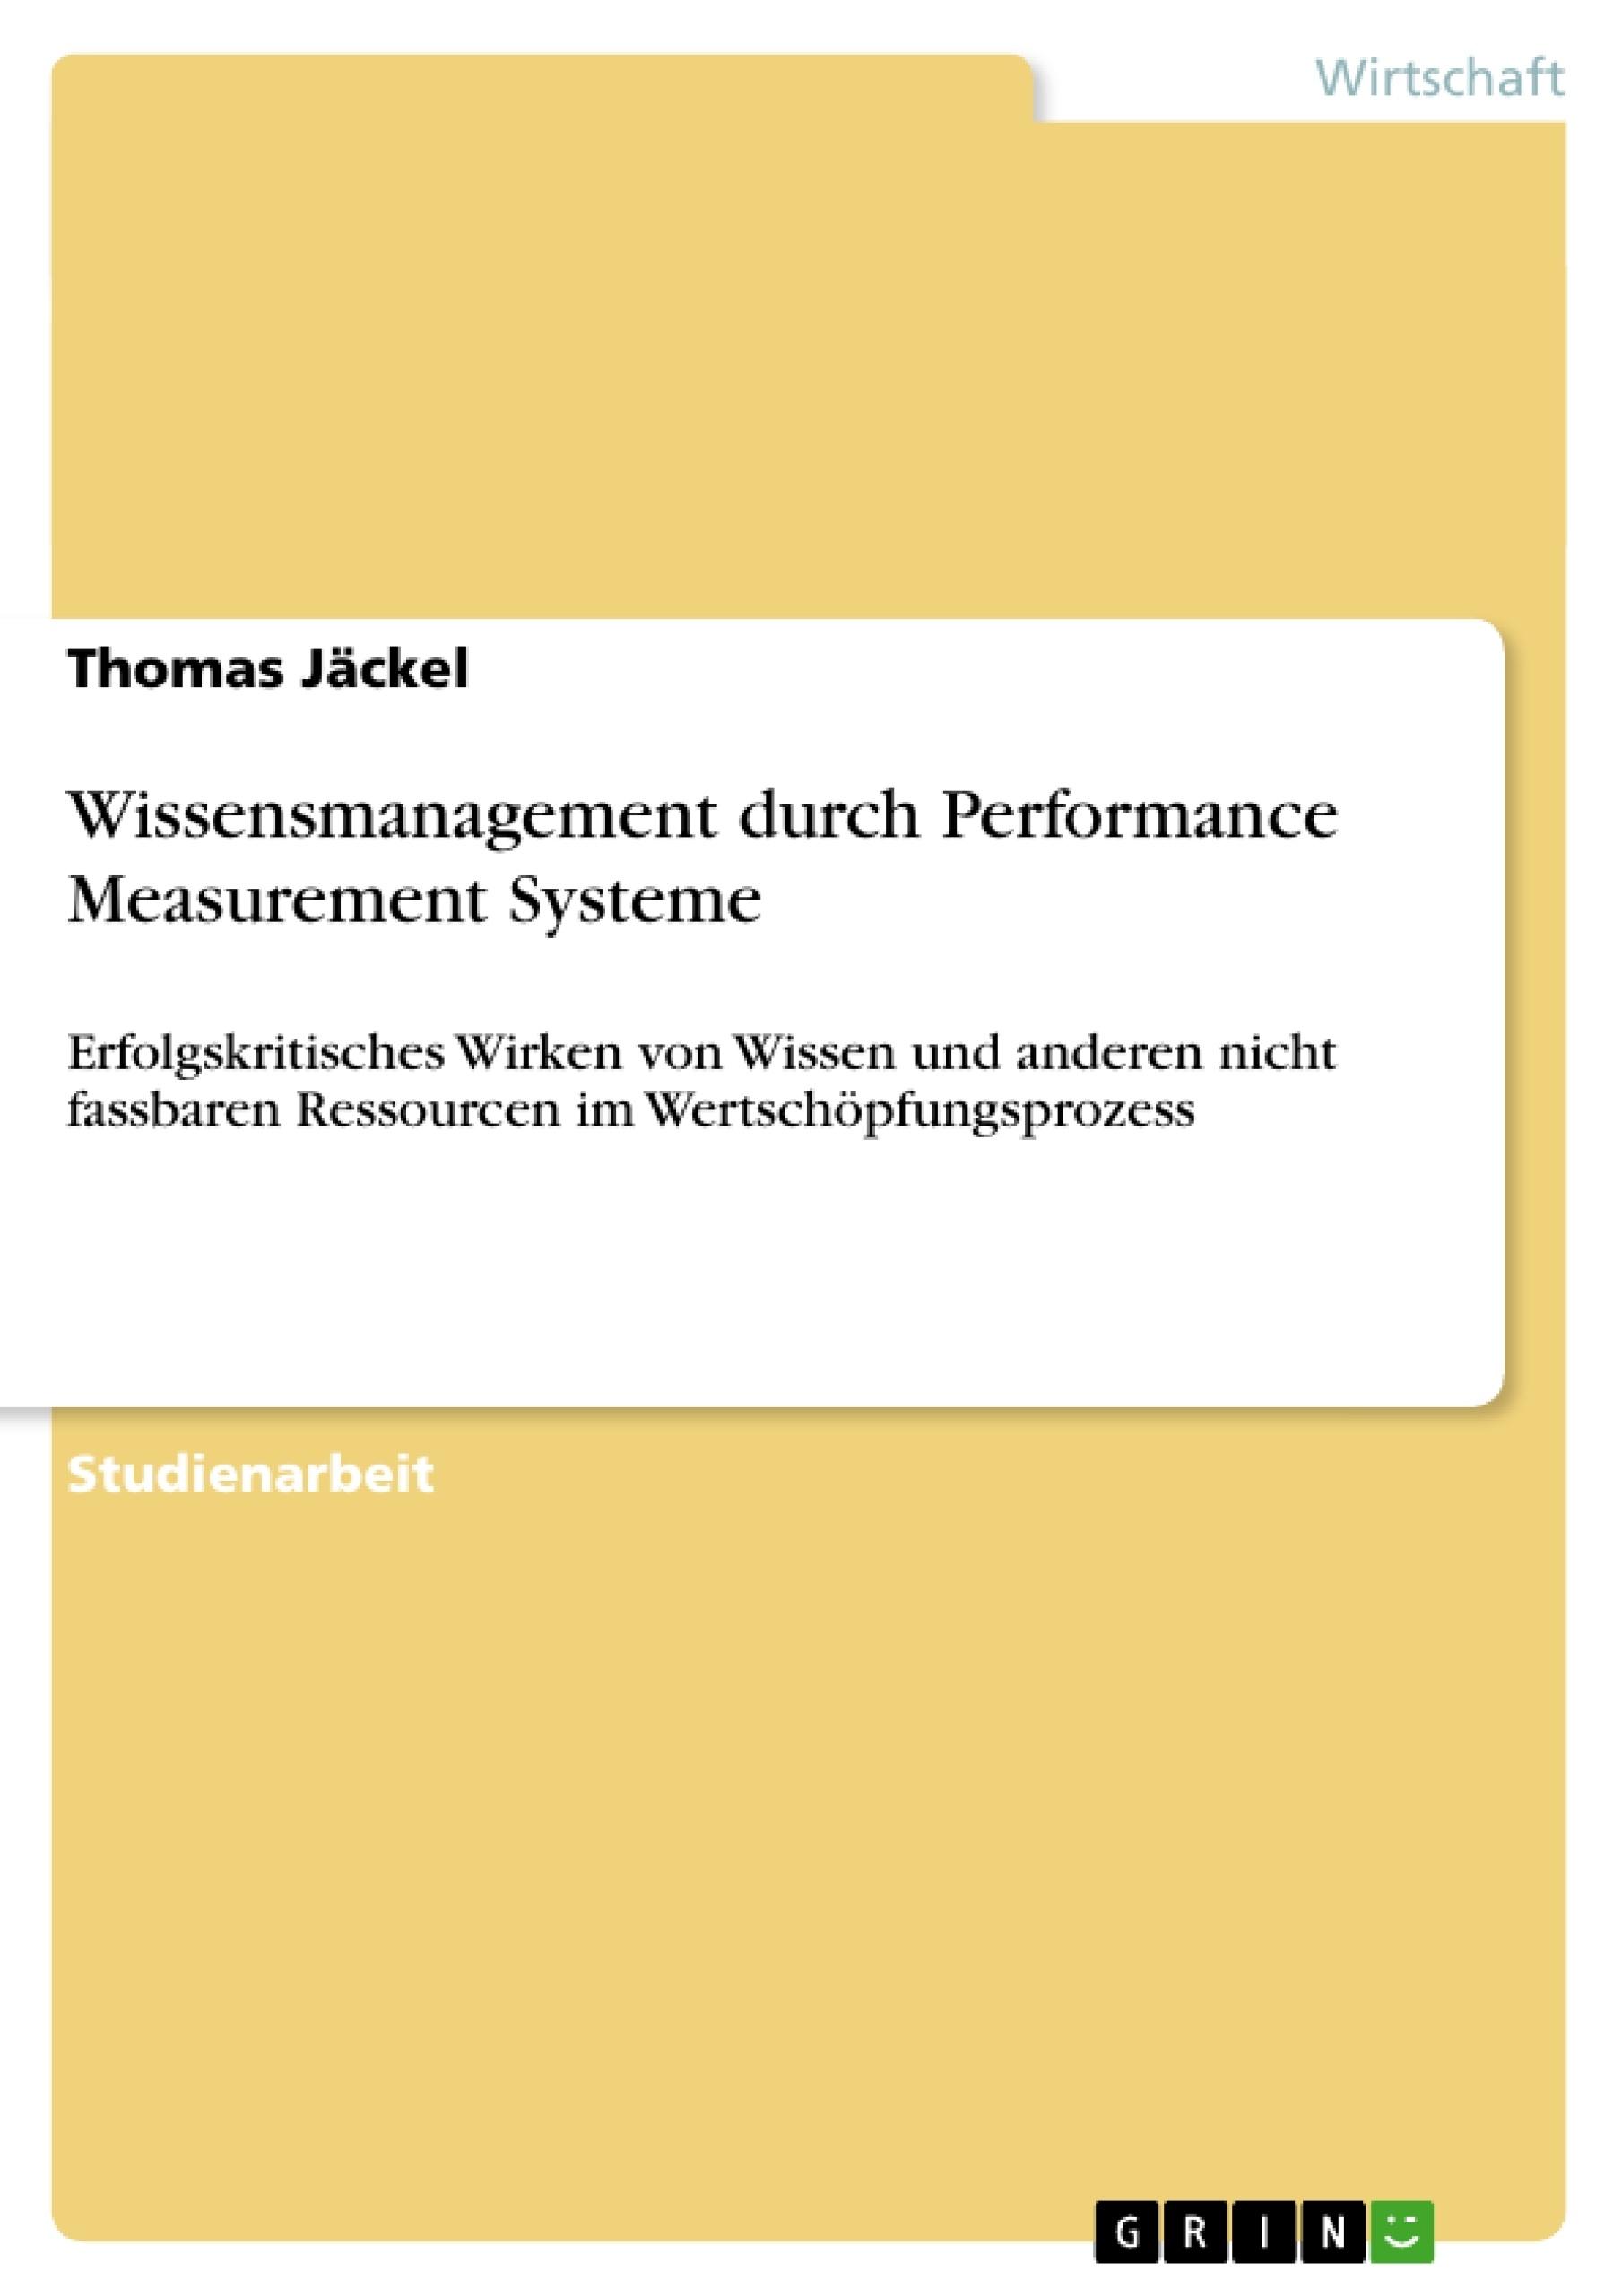 Titel: Wissensmanagement durch Performance Measurement Systeme